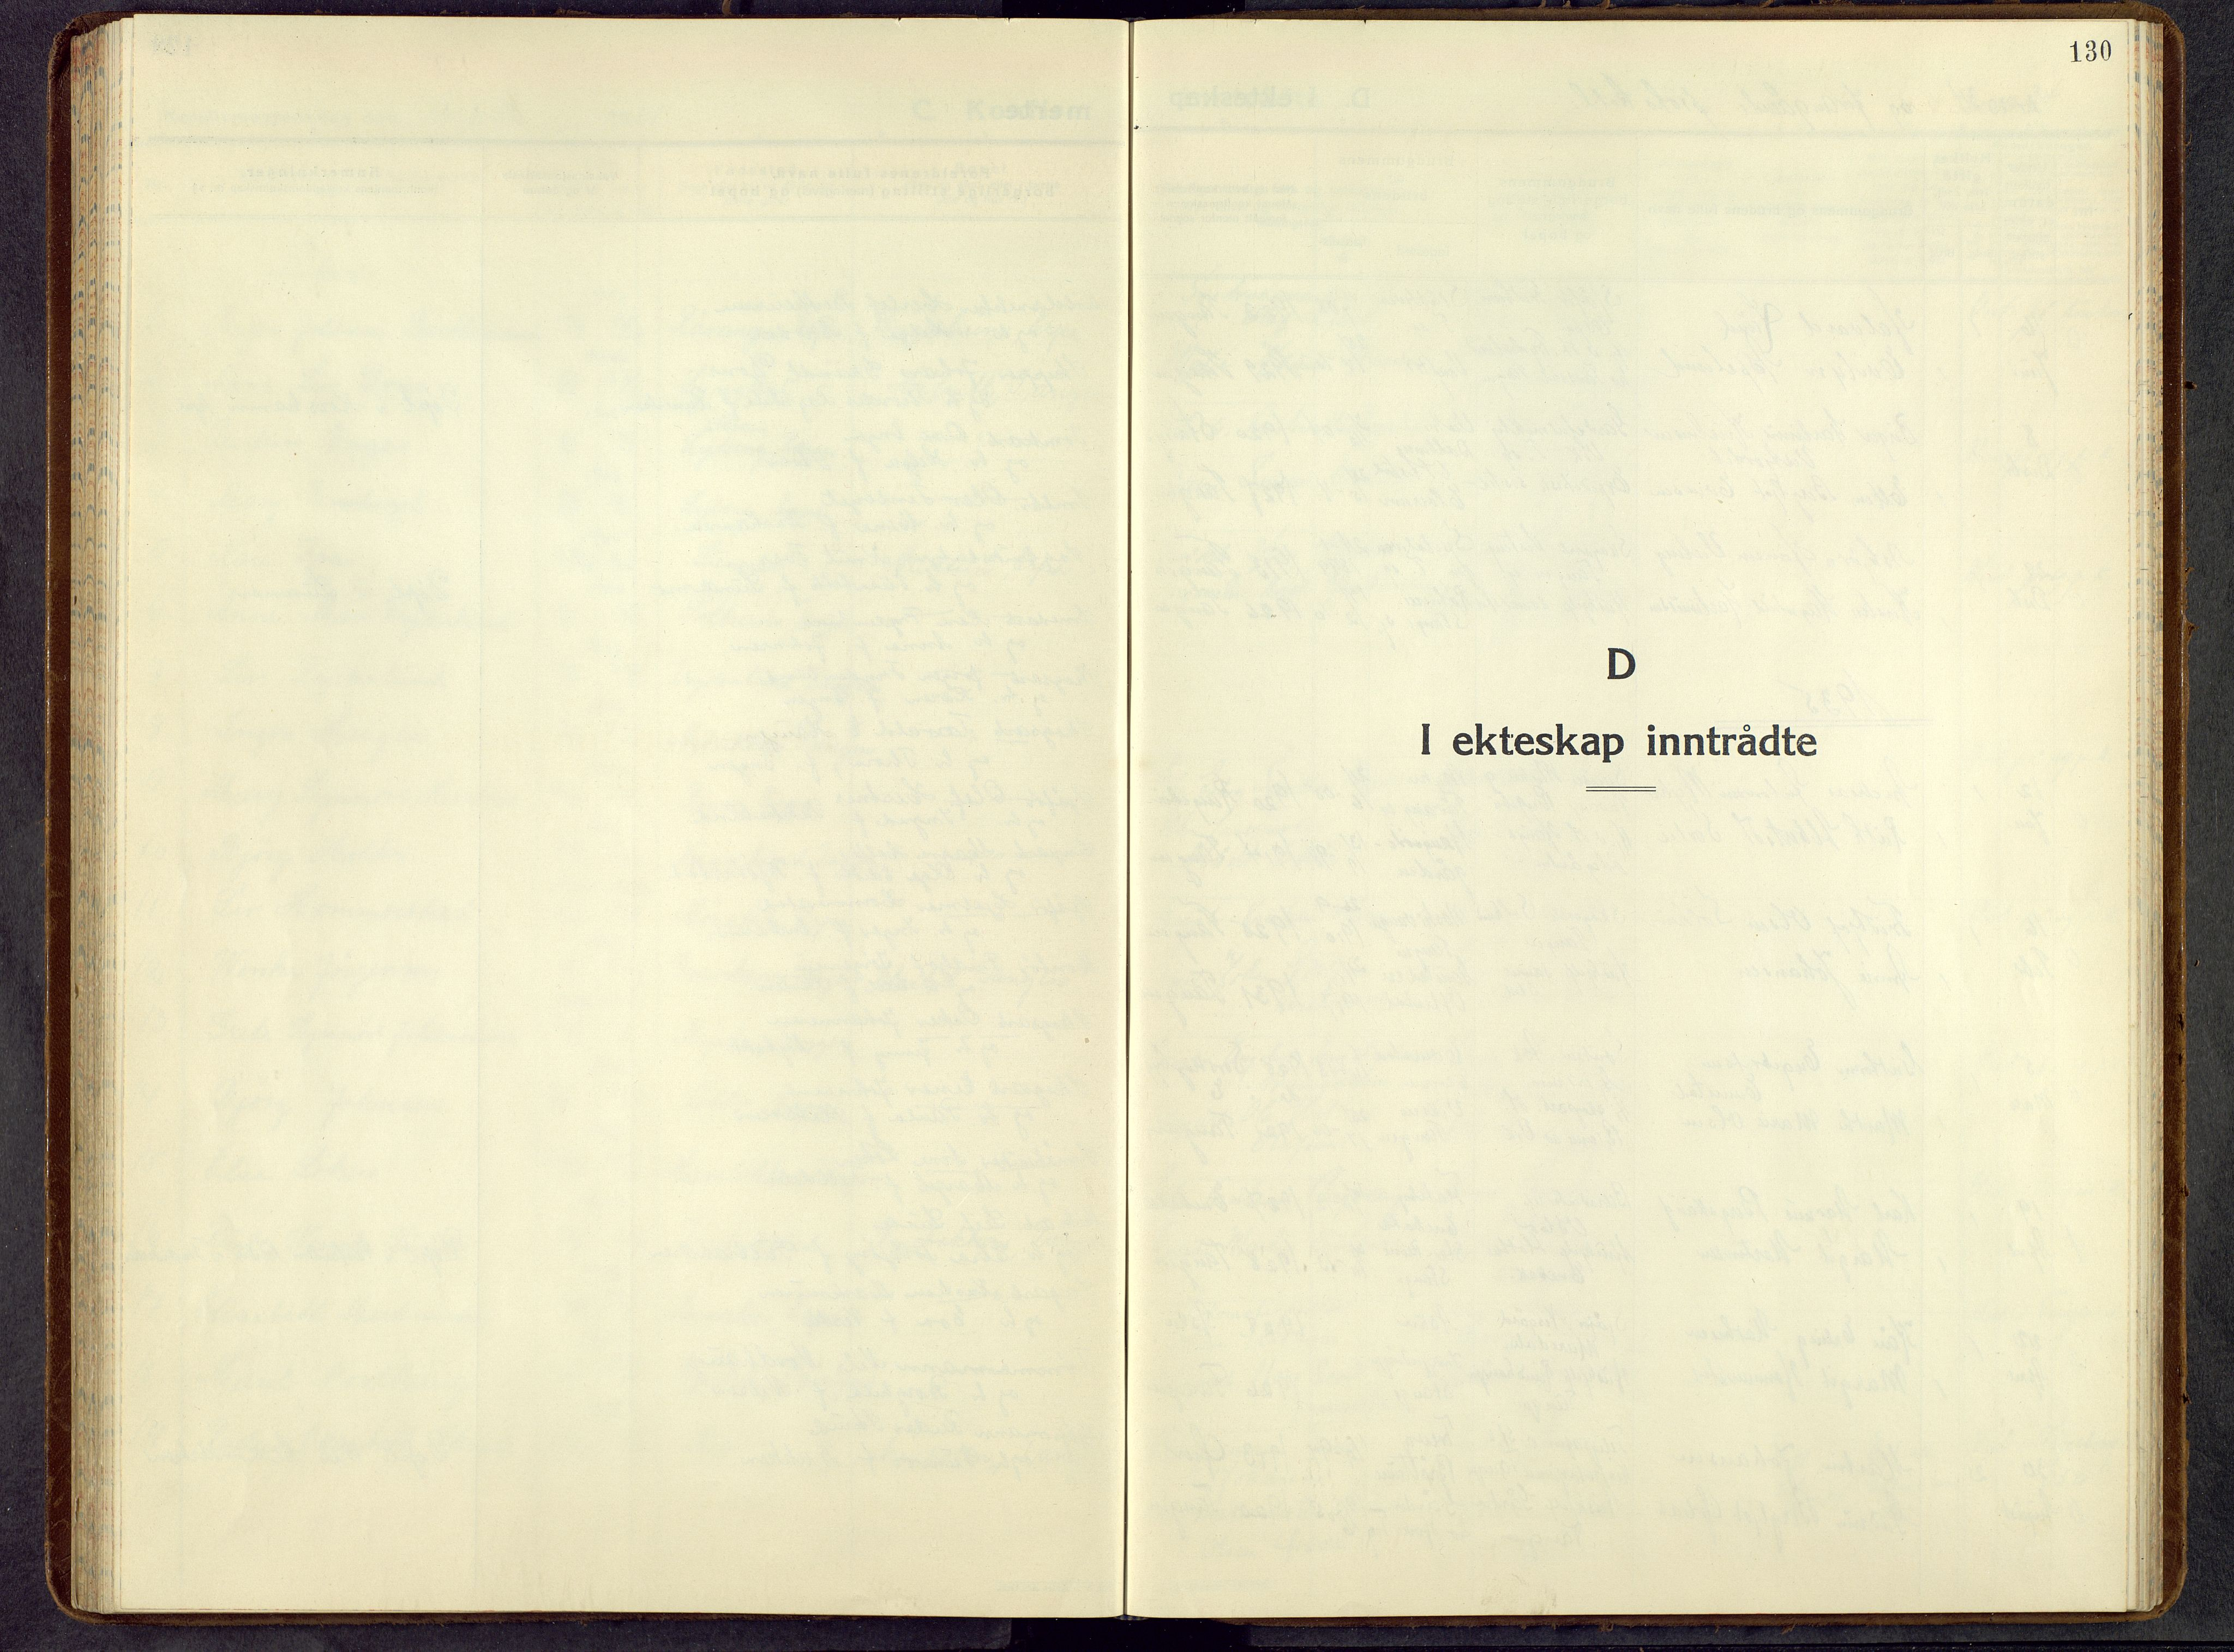 SAH, Stange prestekontor, L/L0021: Parish register (copy) no. 21, 1937-1962, p. 130